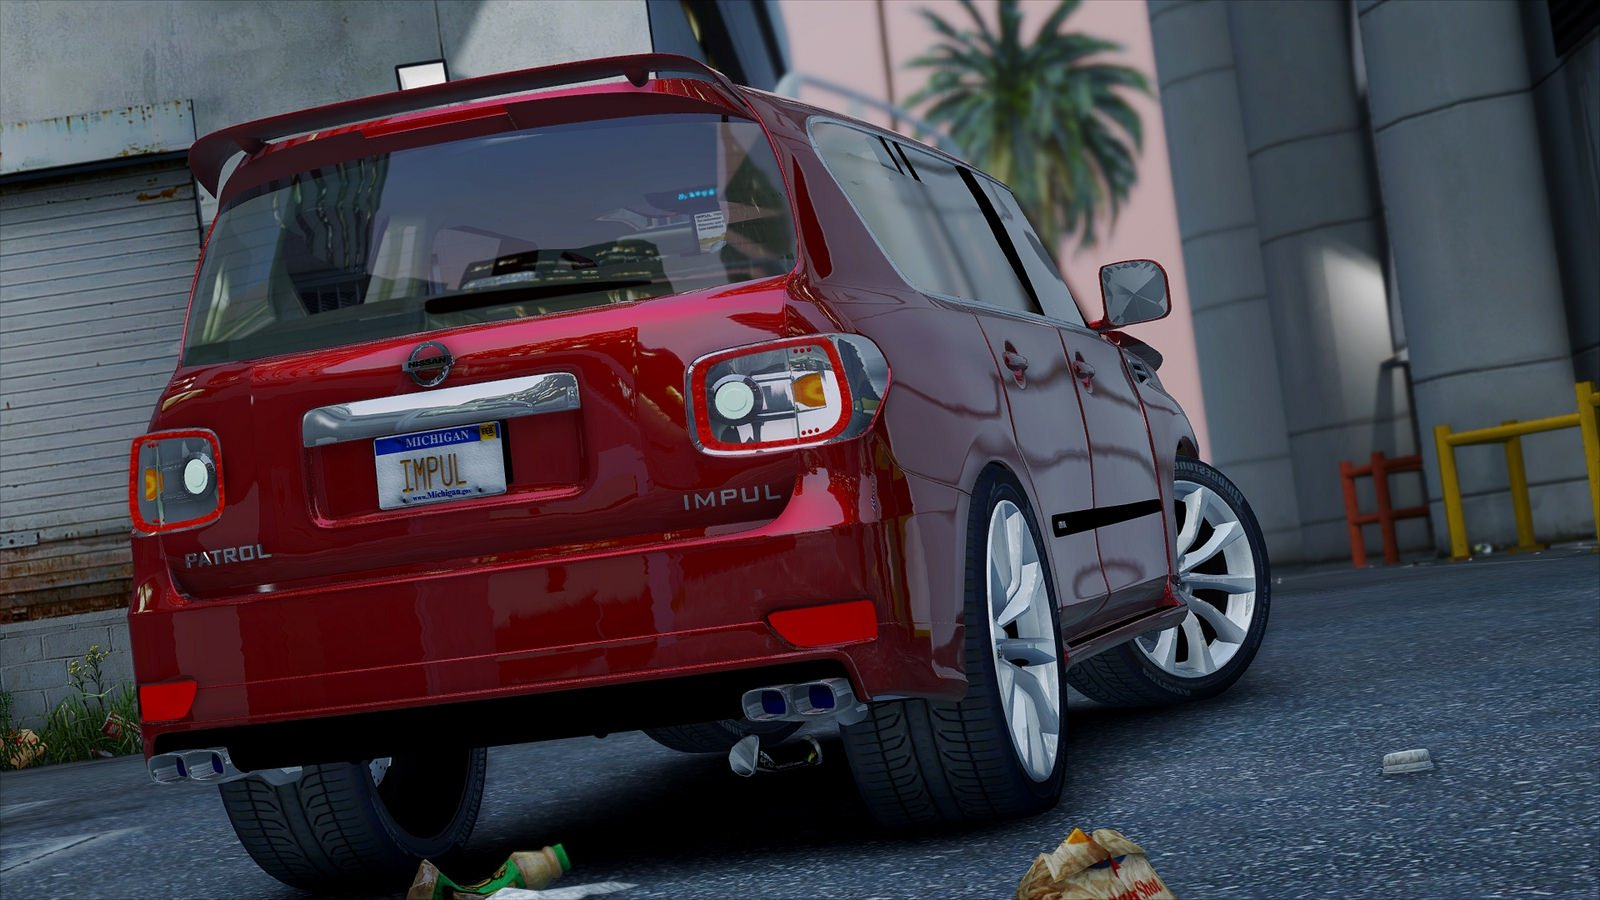 2014 Nissan Patrol Impul для GTA V - Скриншот 2